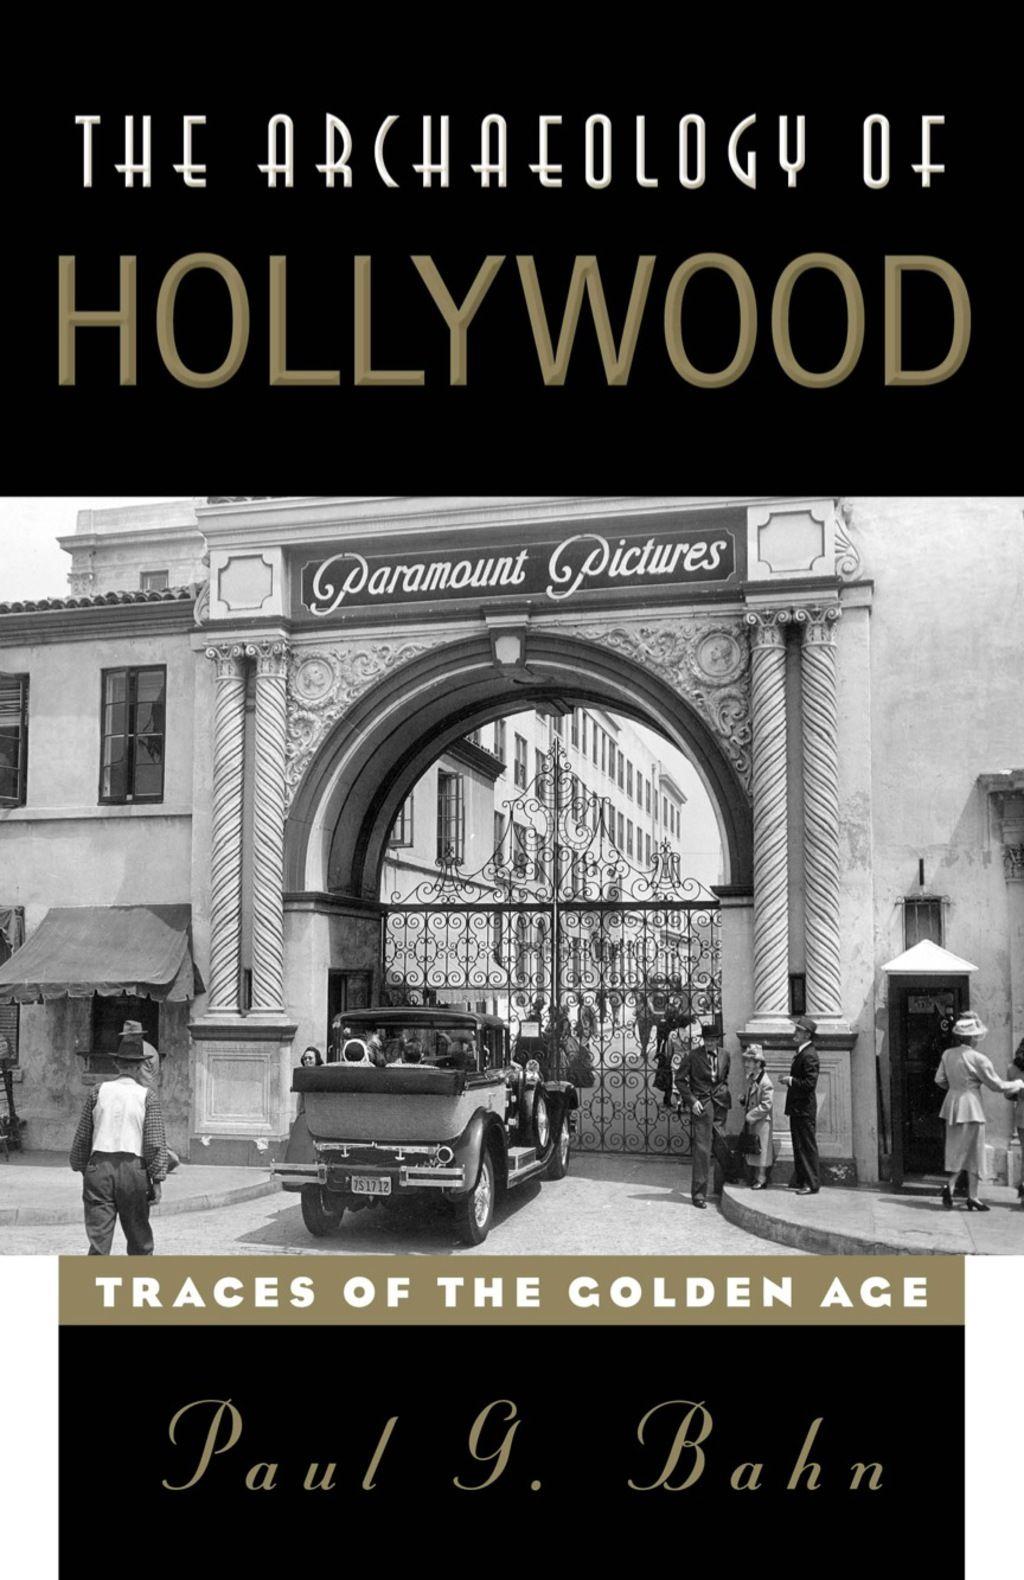 The Archaeology of Hollywood (eBook) #hollywoodgoldenage